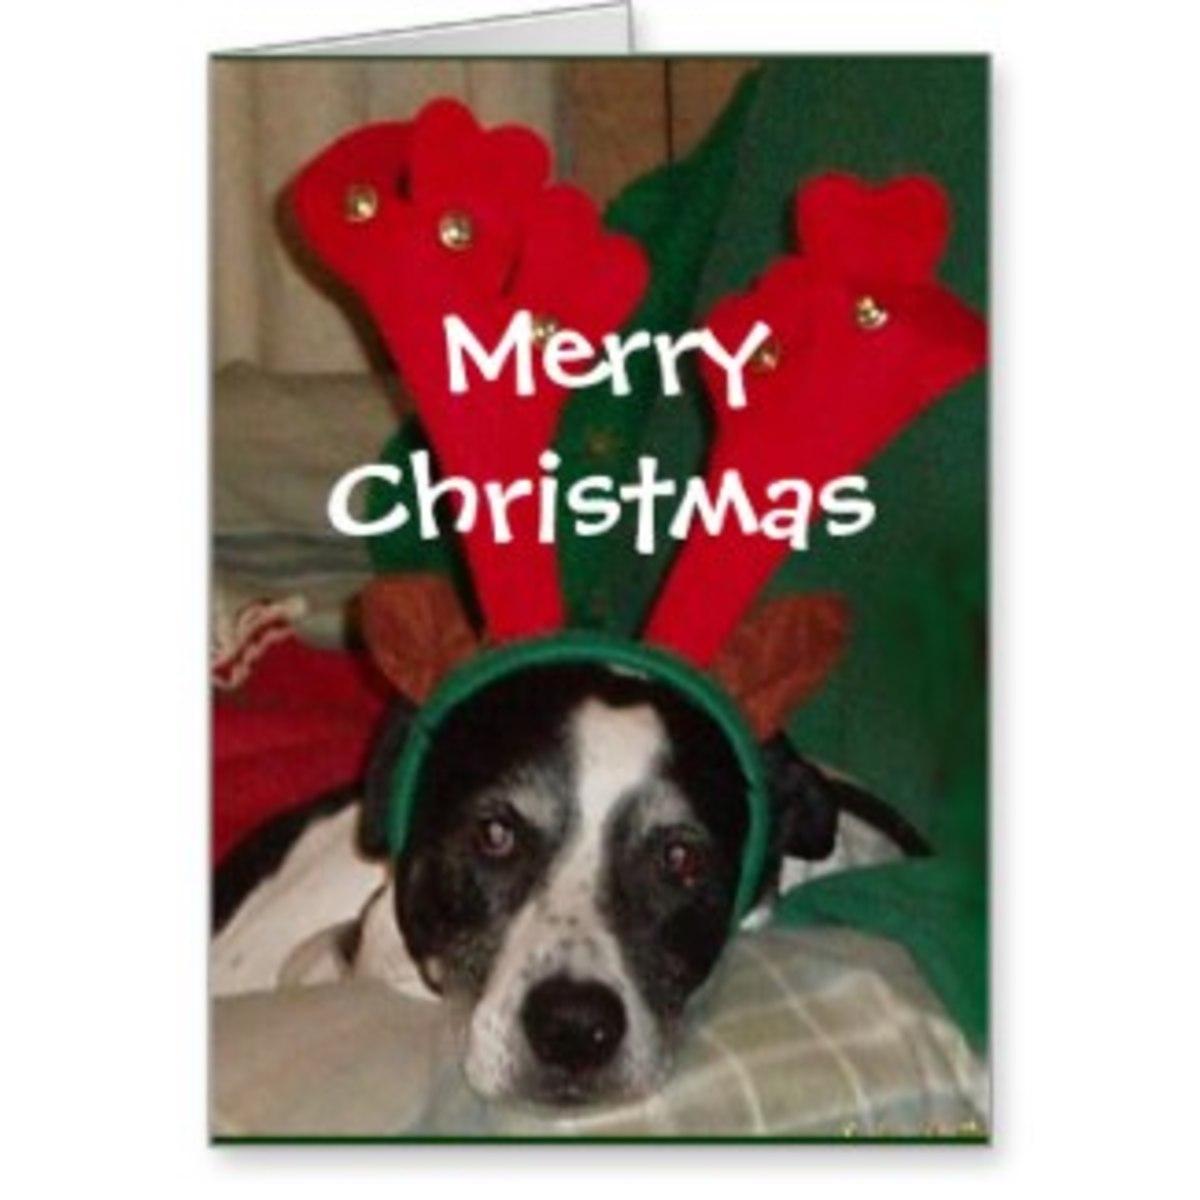 Happy Holidays cher!